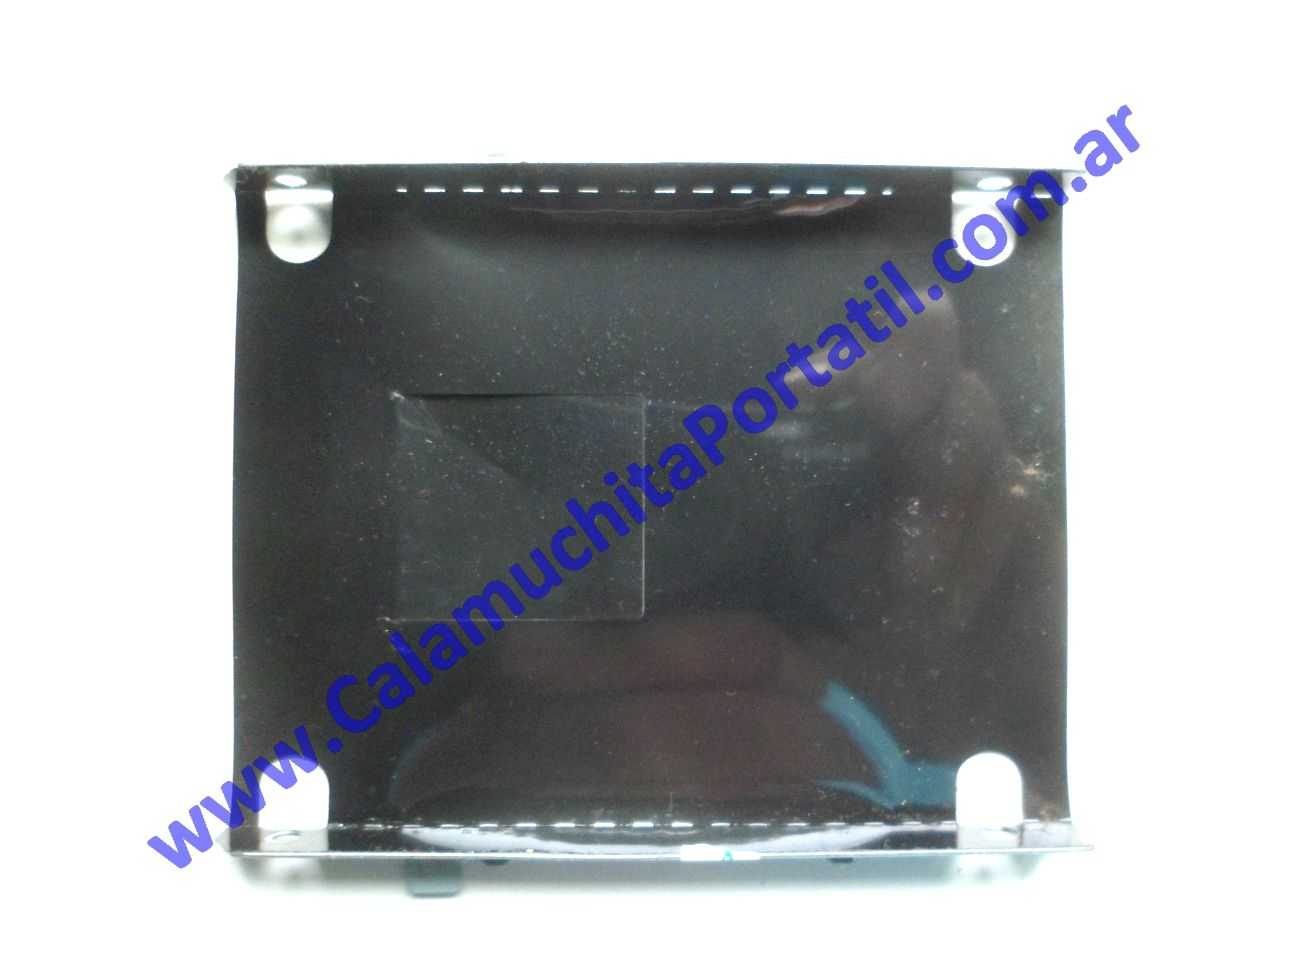 0534GCA Carry Disk Lenovo IdeaPad S10-2 / 2957